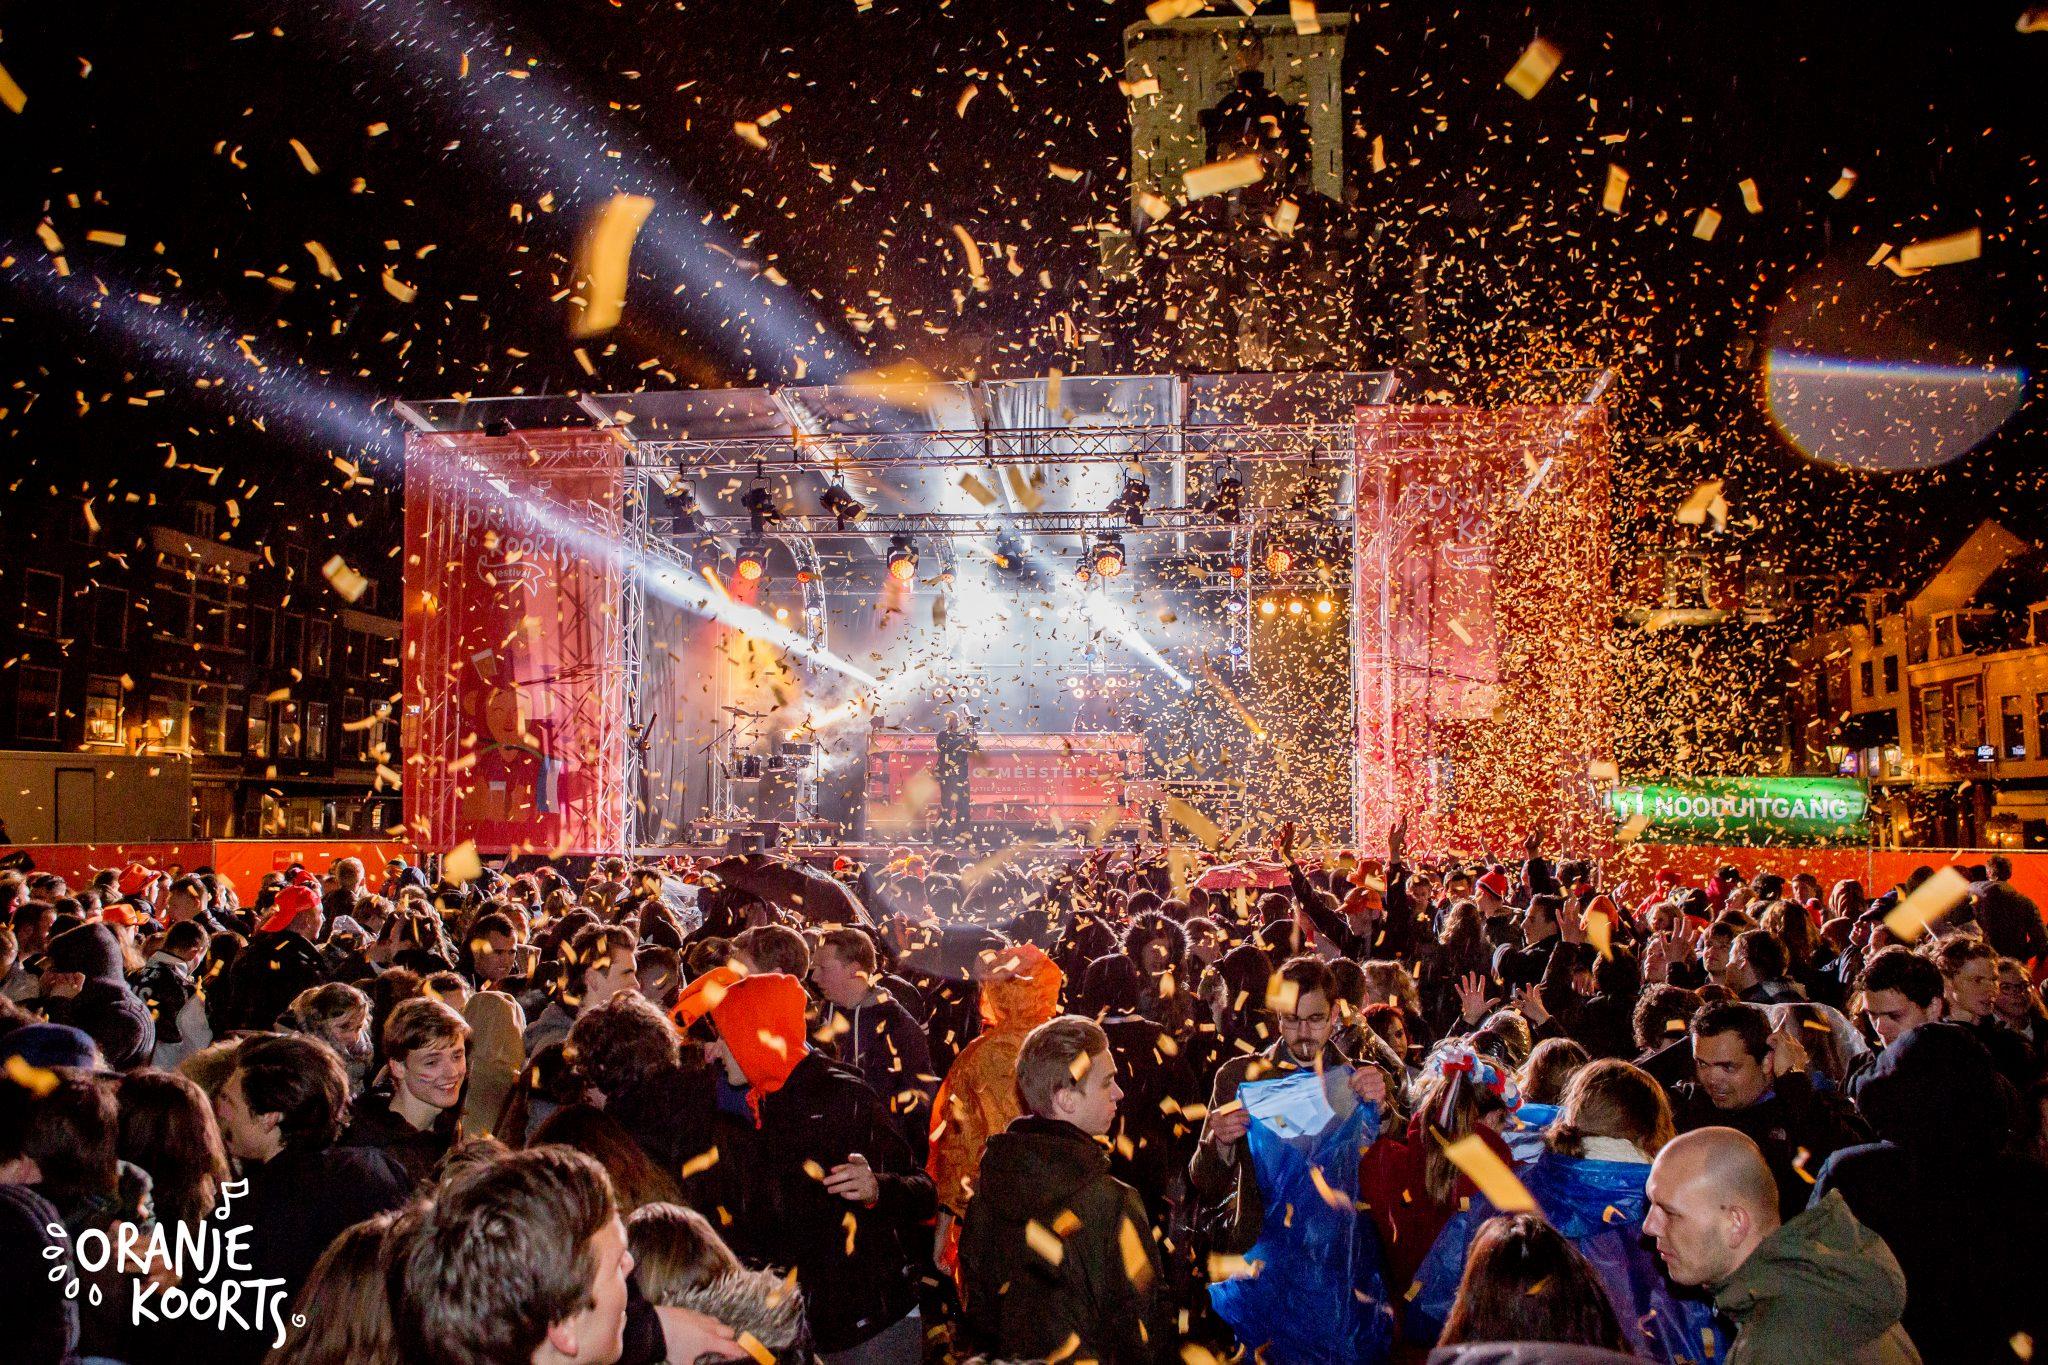 oranjekoorts koningsnacht festival